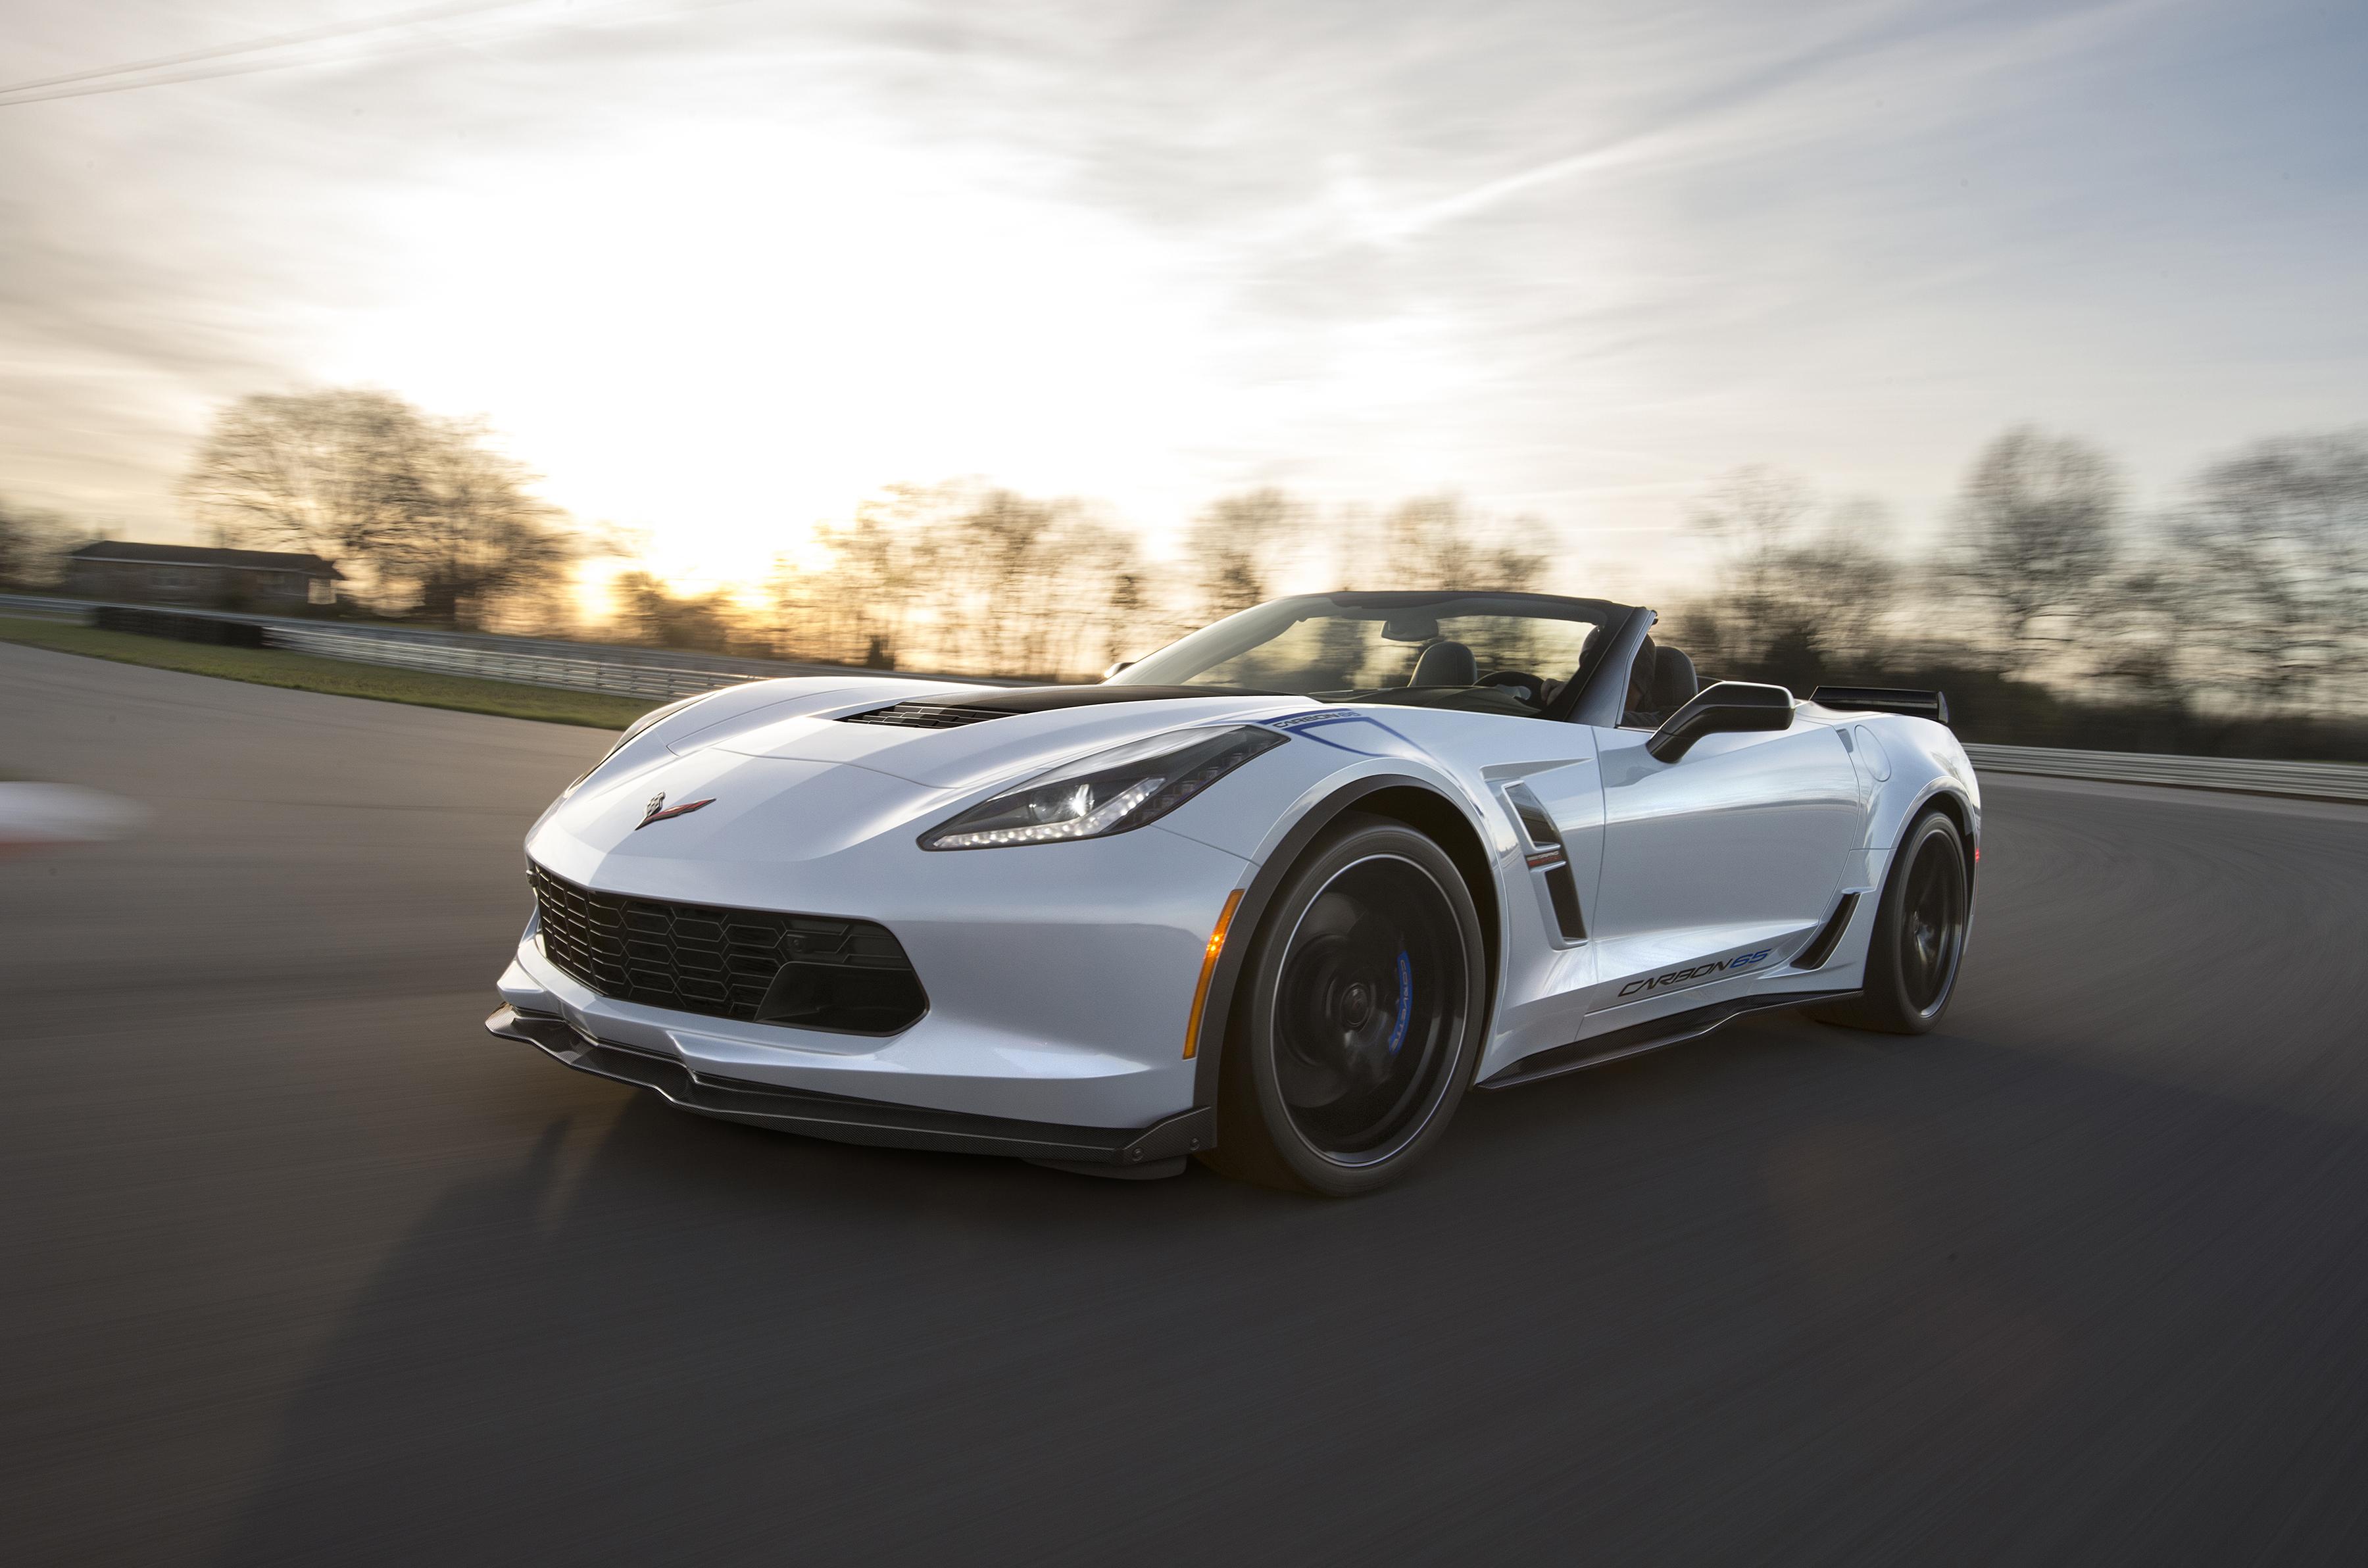 2018 Corvette Specs – National Corvette Museum